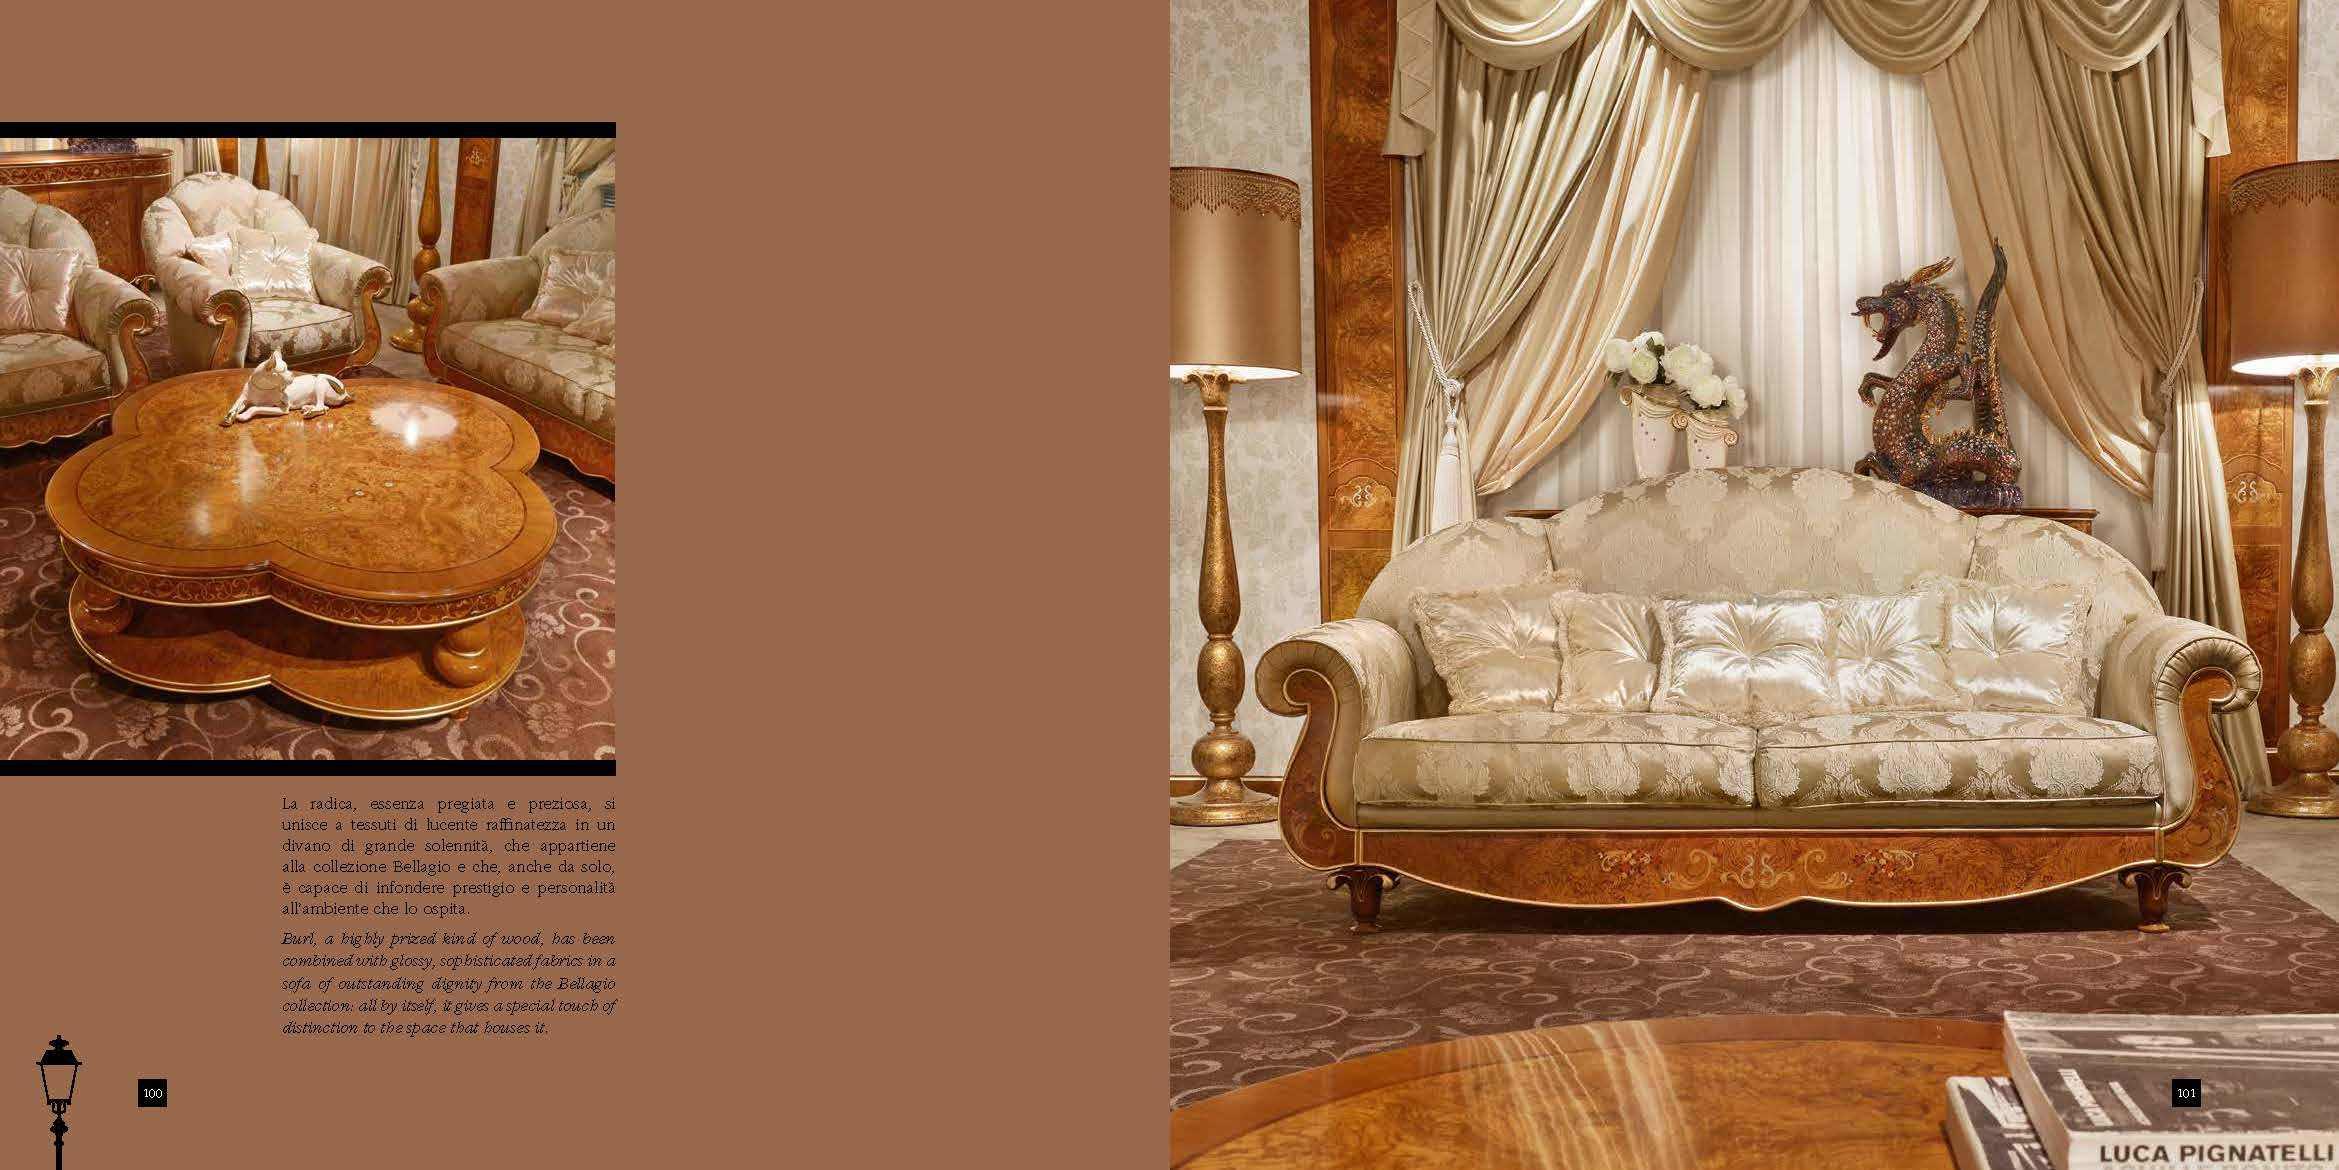 SIGNORINI COCO家具:卓越品质,源于不懈追求